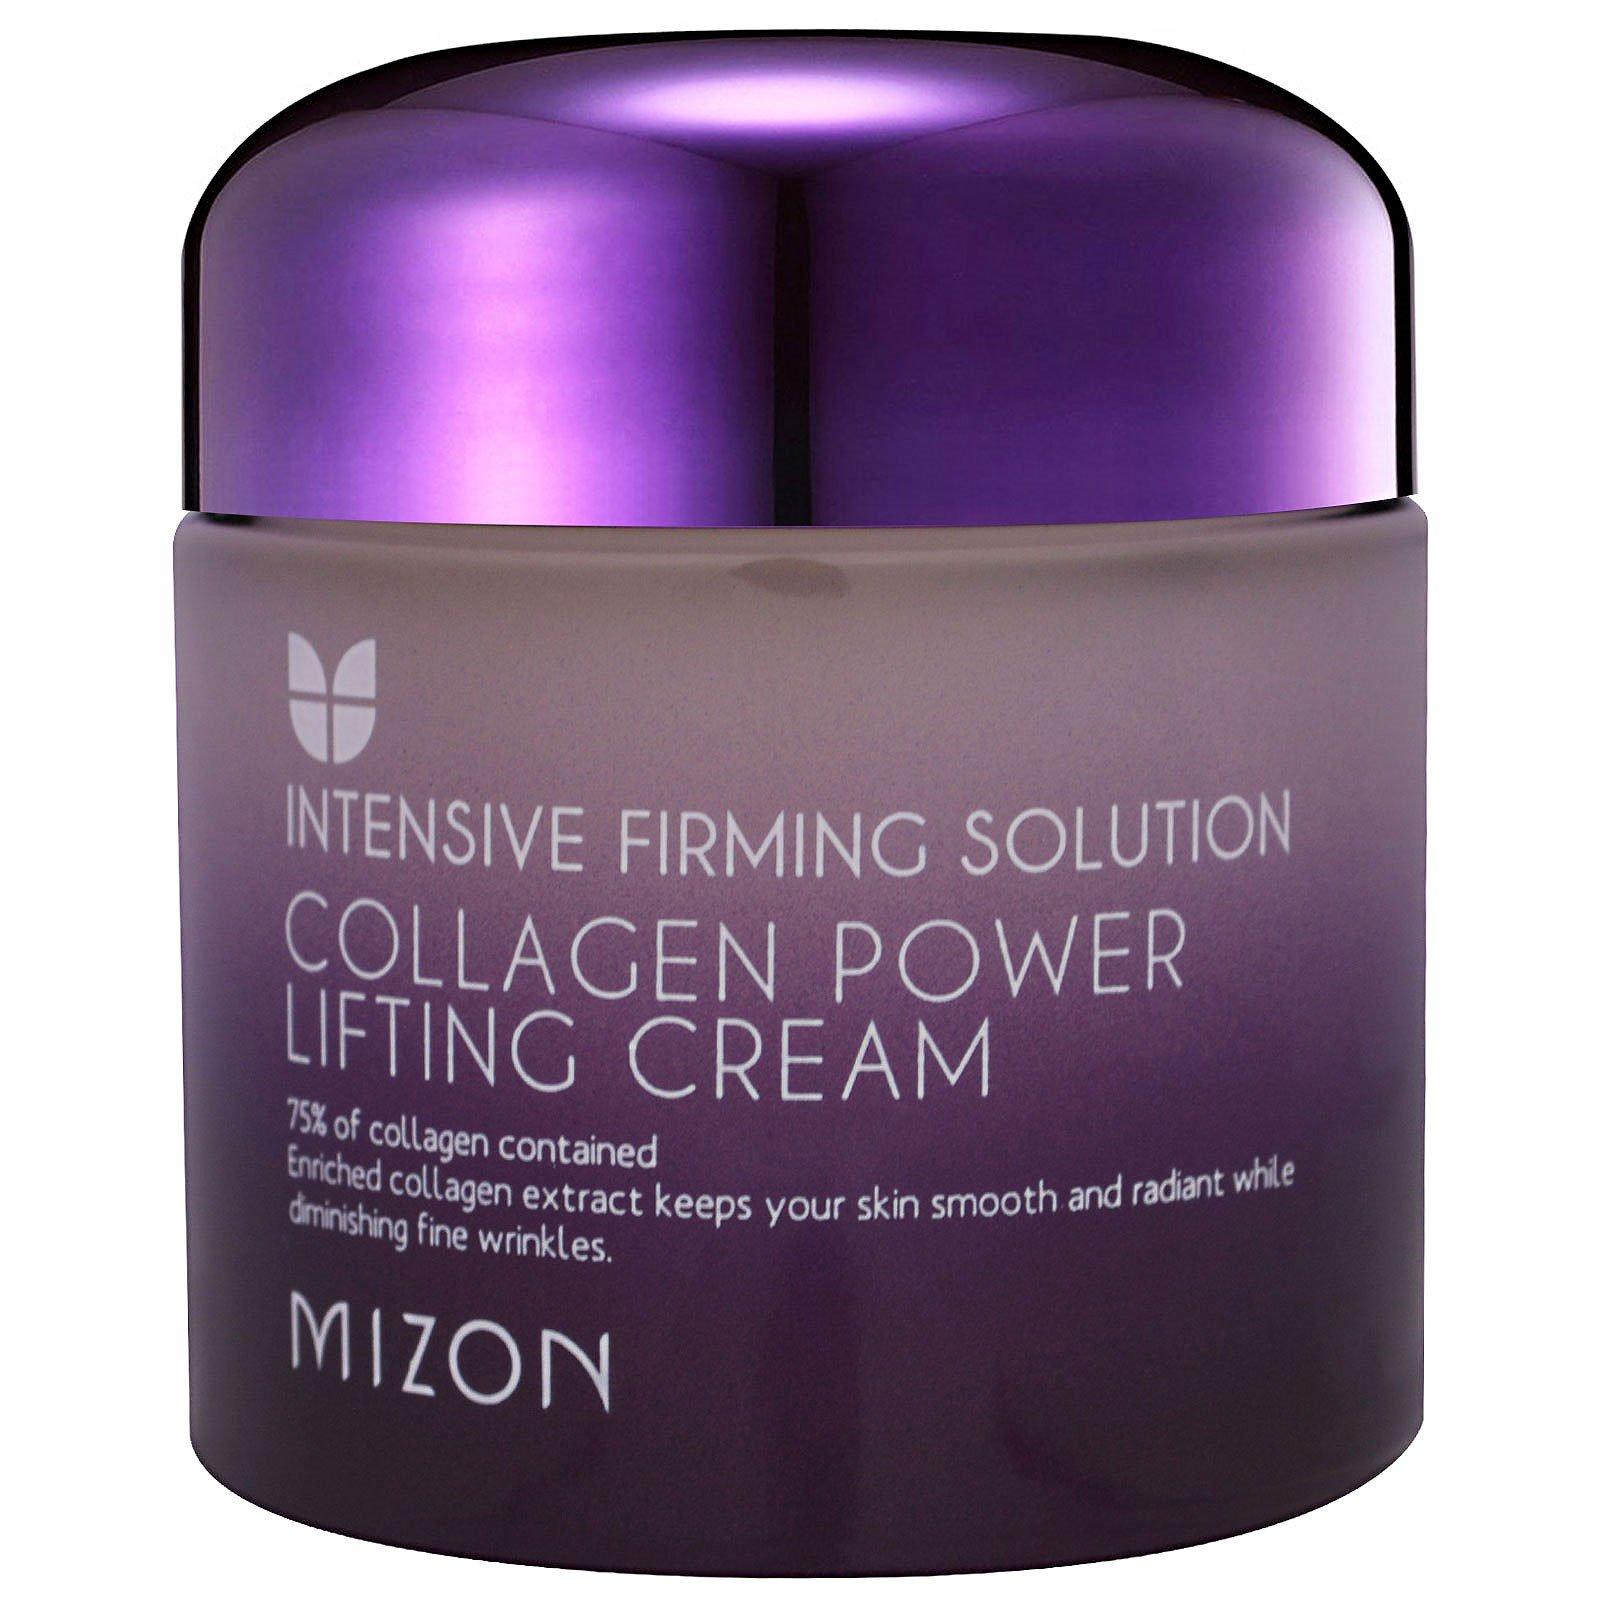 1c908fcaf63 Mizon, Collagen Power Lifting Cream, 2.53 oz (75 ml) - iHerb.com